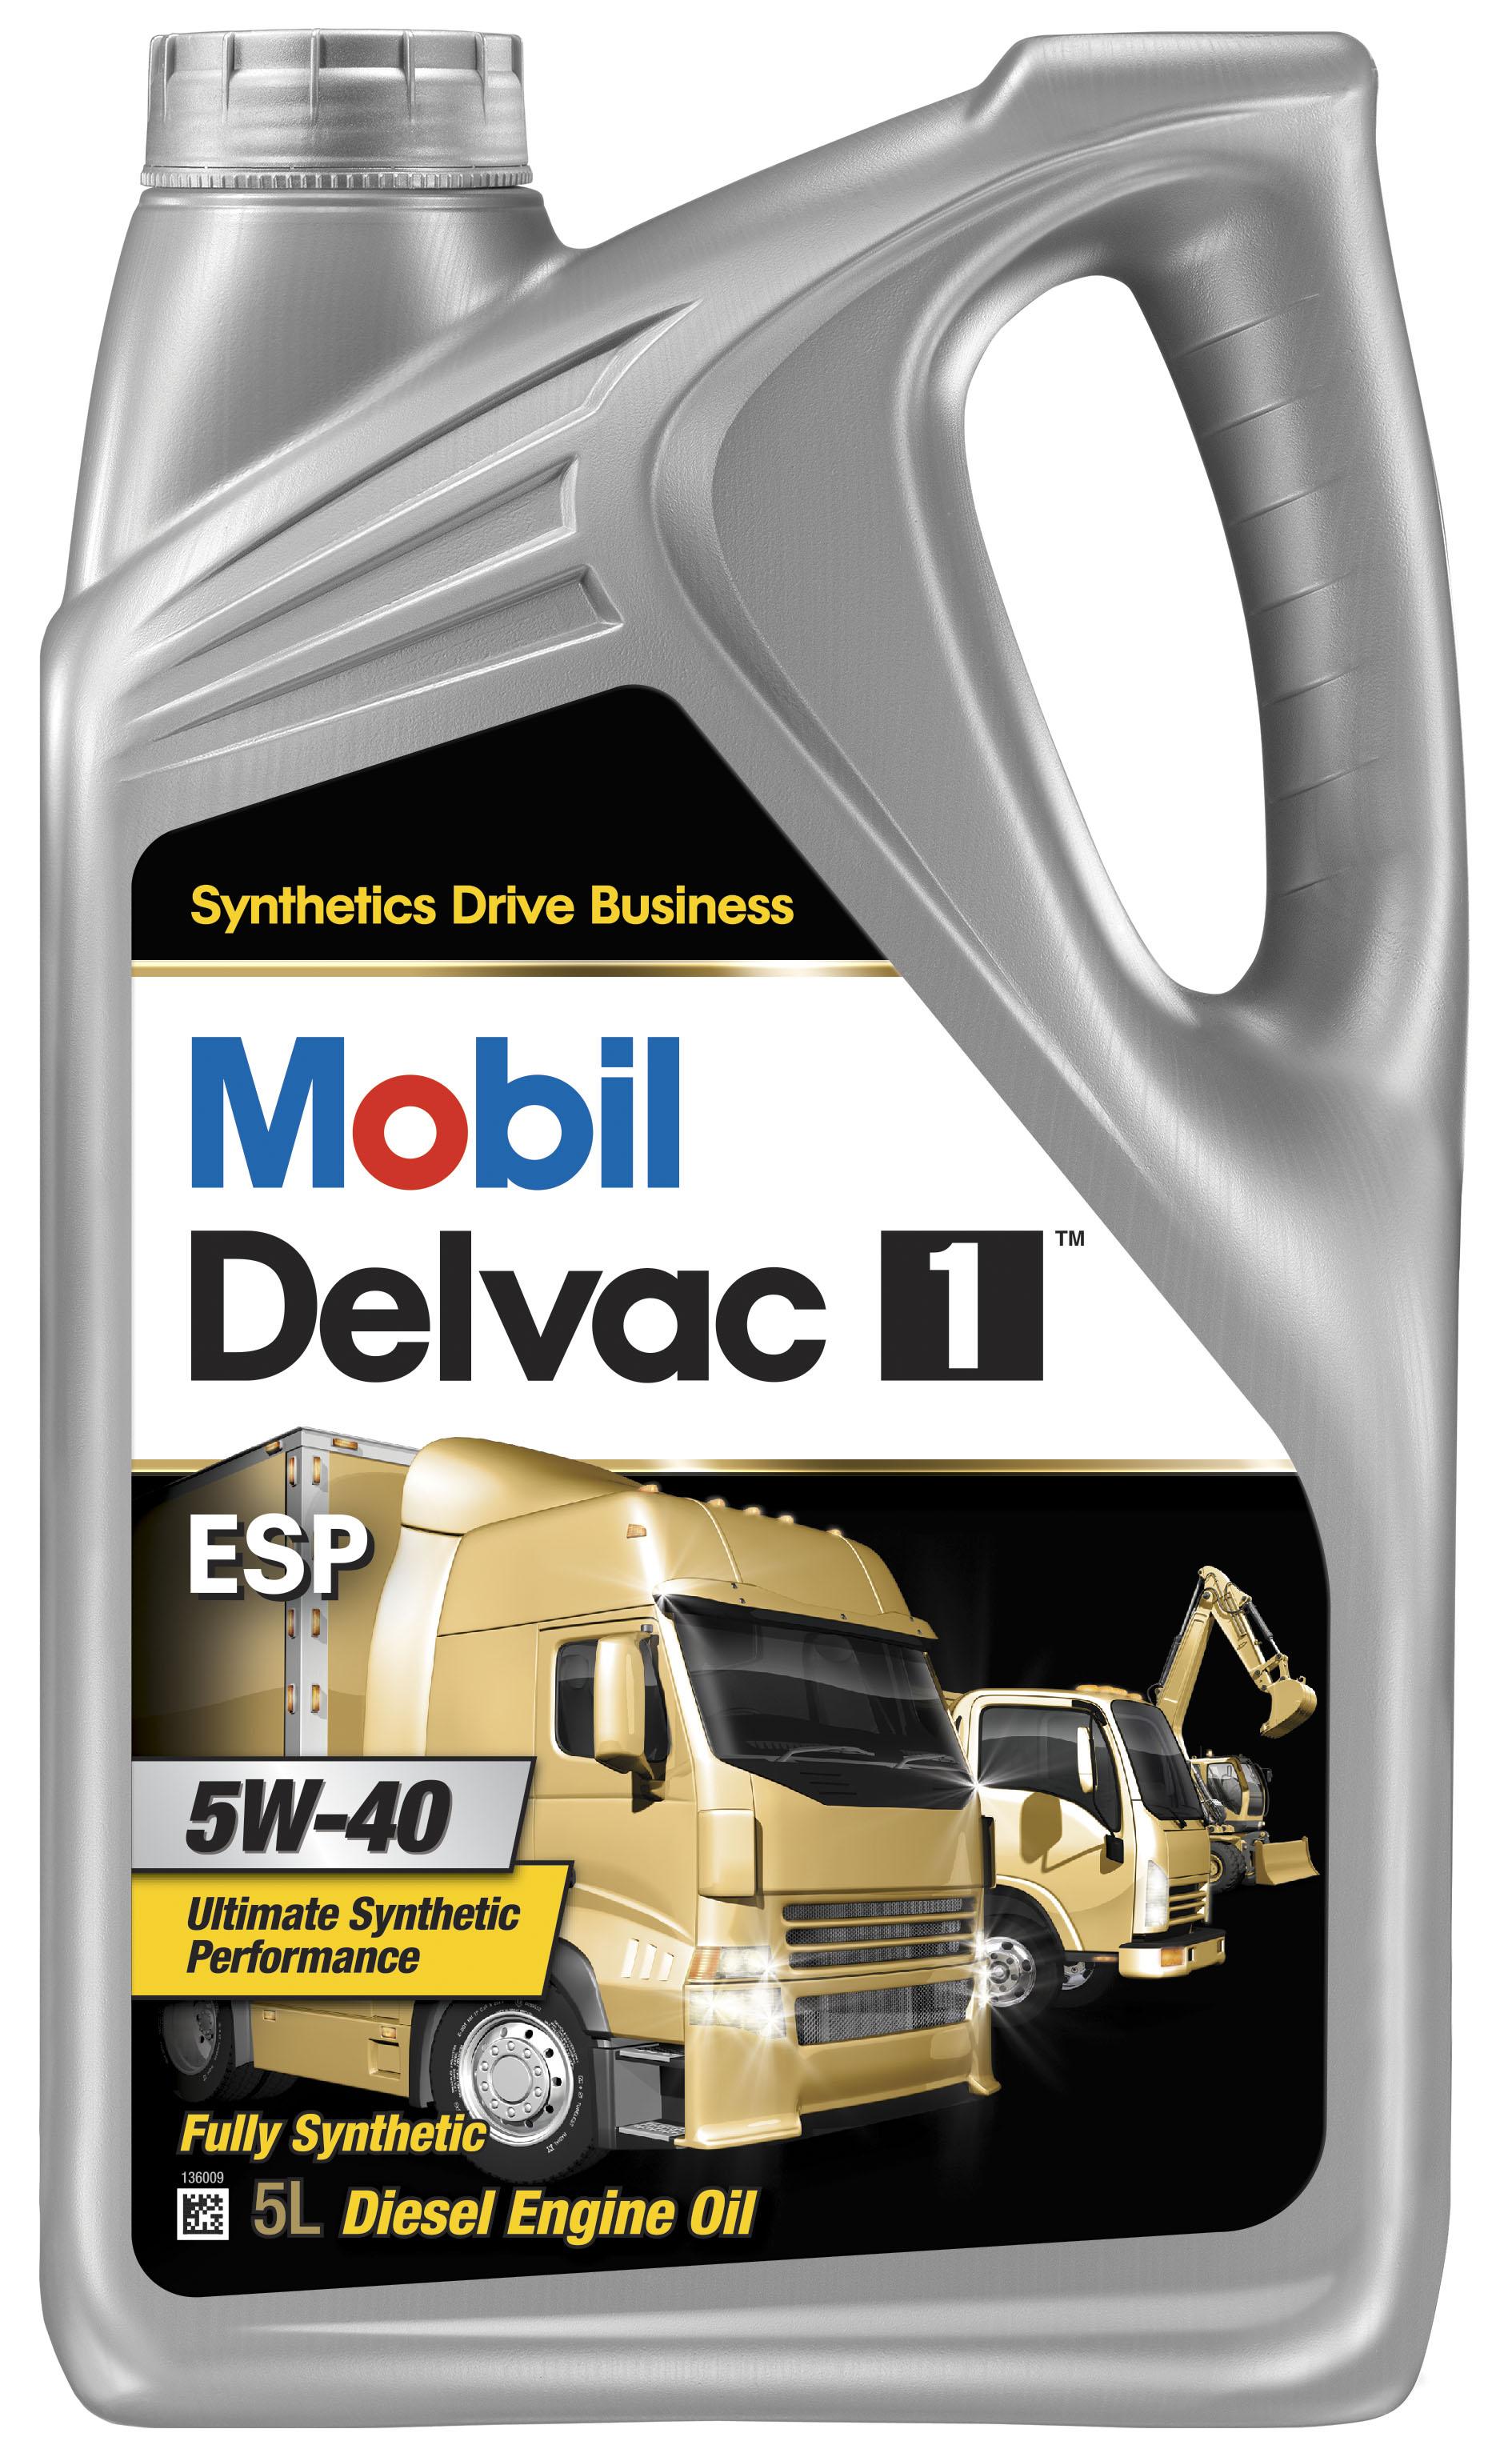 Mobil Delvac 1 ESP 5W40 Image